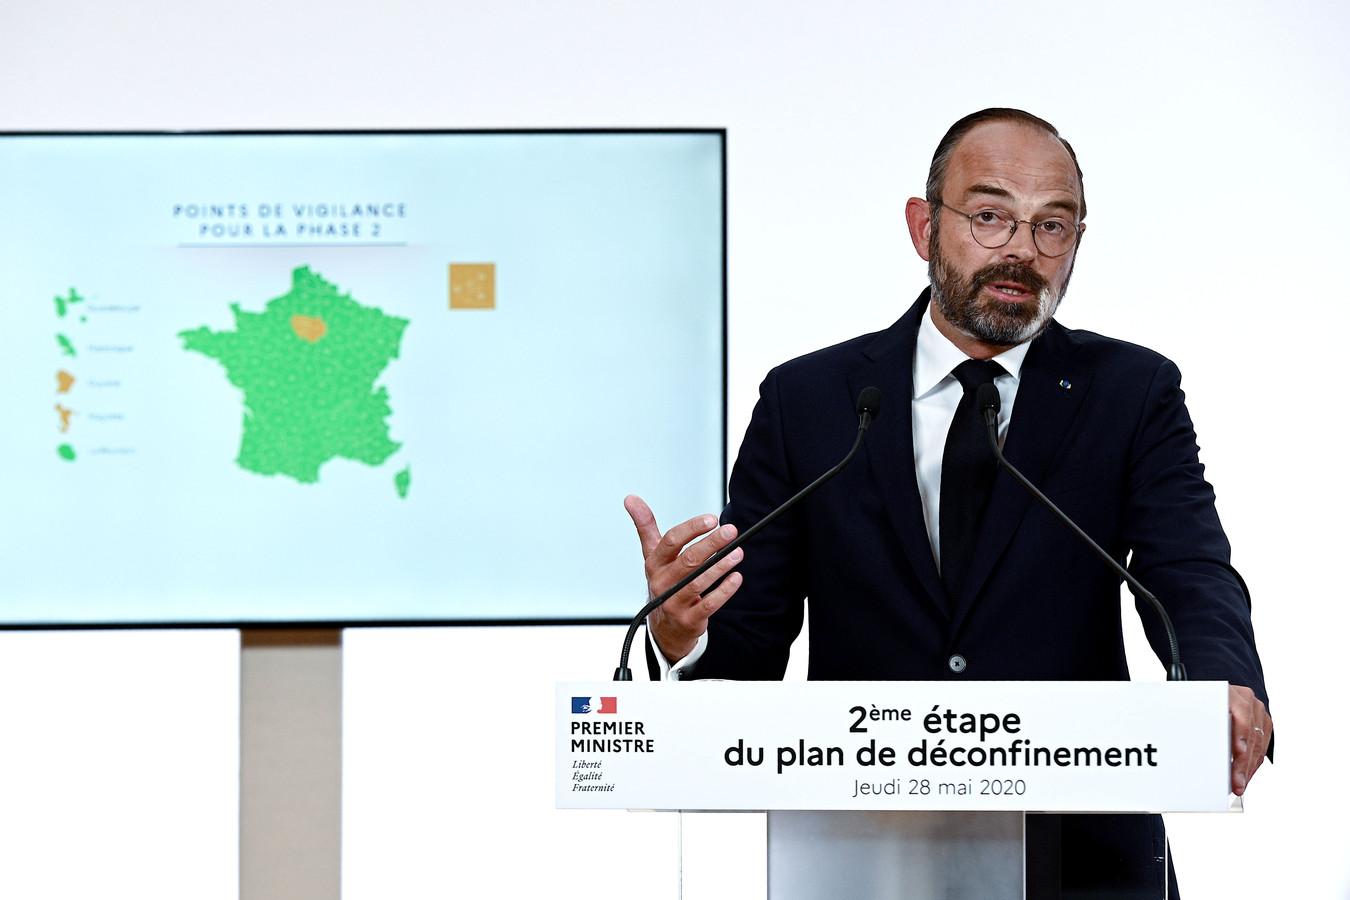 De Franse premier Edouard Philippe.